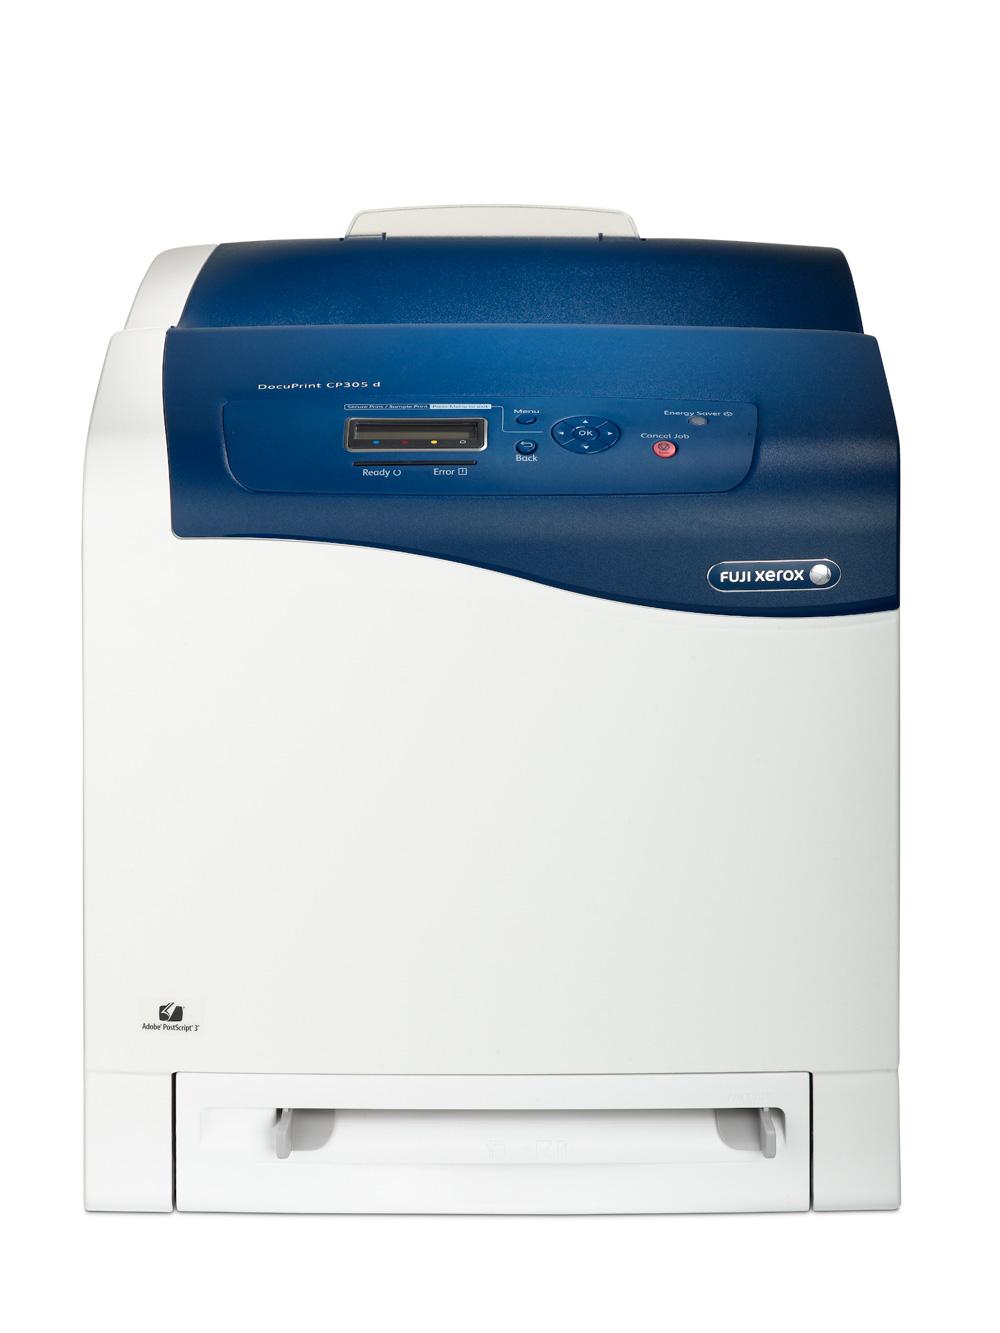 Xerox DocuPrint P8ex - driver download software FOUND